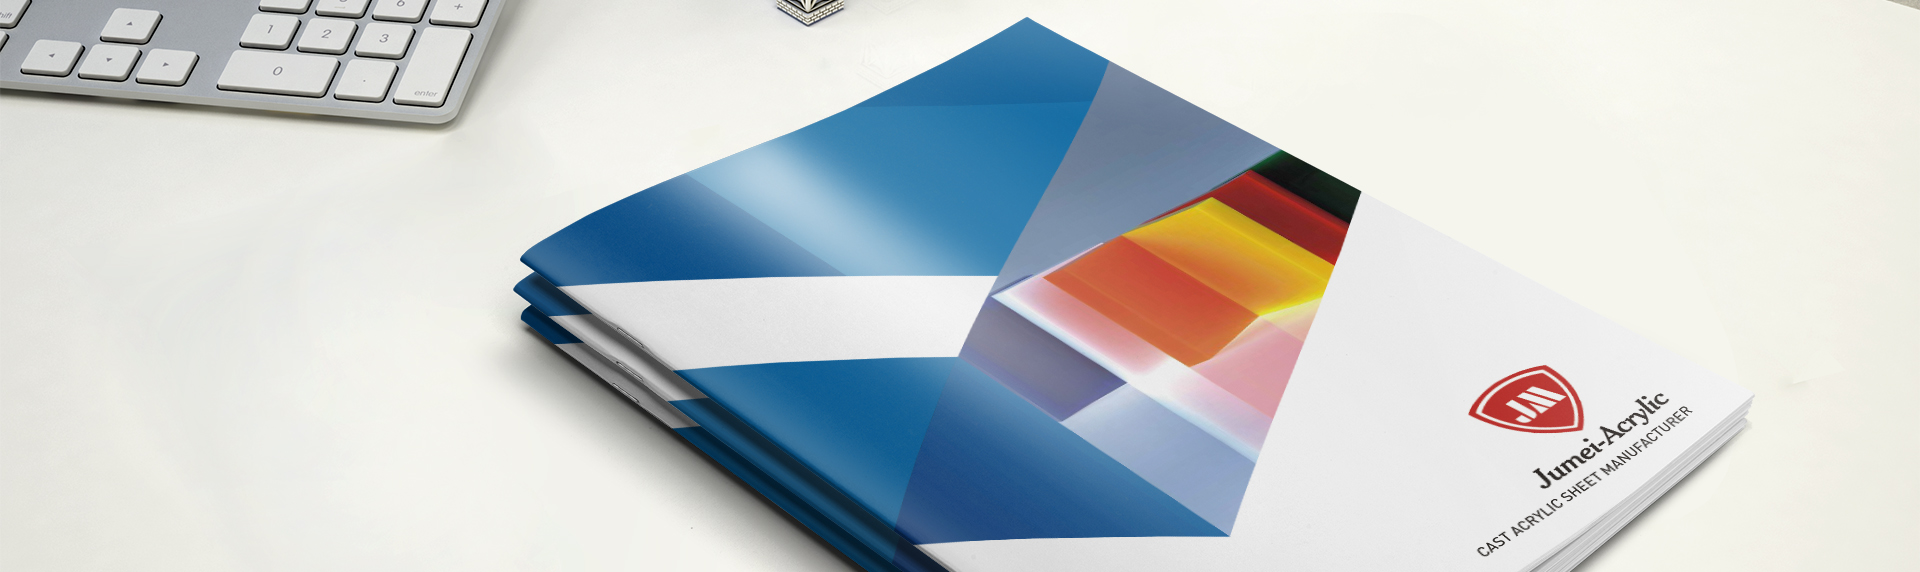 SSC设计-聚美画�册设计ㄨ